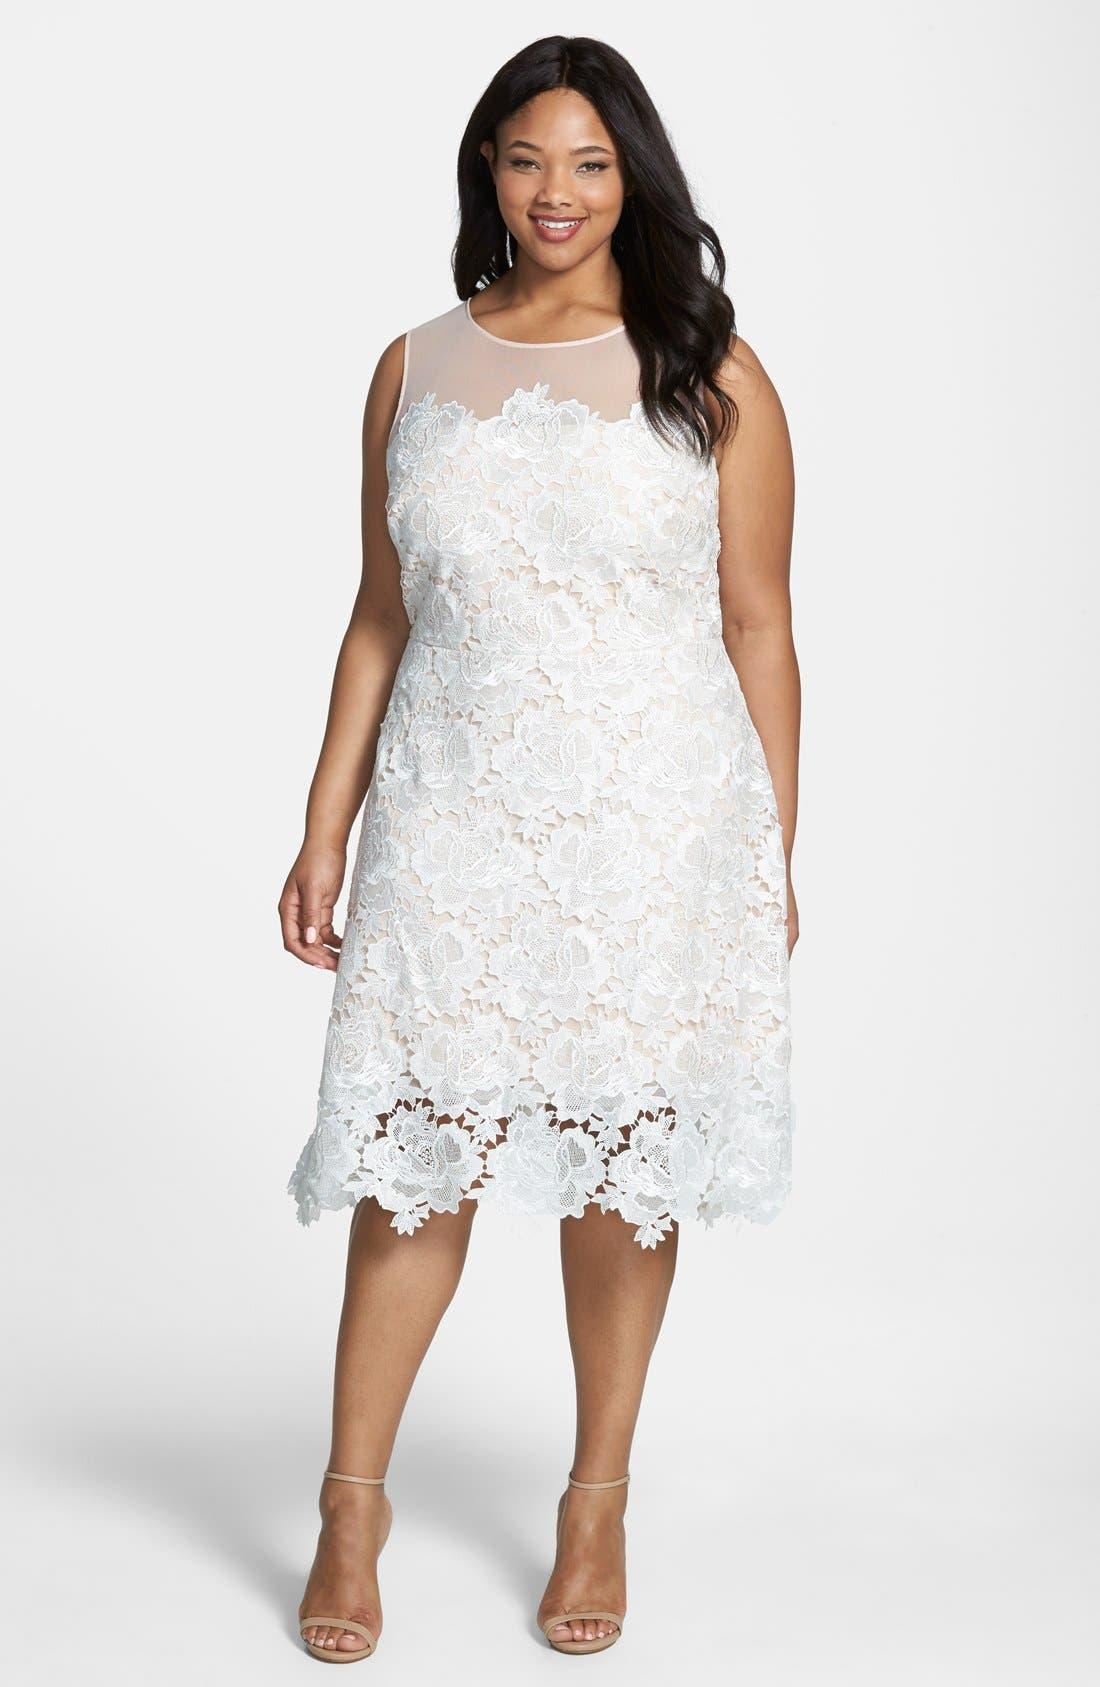 Alternate Image 1 Selected - Julia Jordan Floral Lace Sleeveless Sheath Dress (Plus Size)